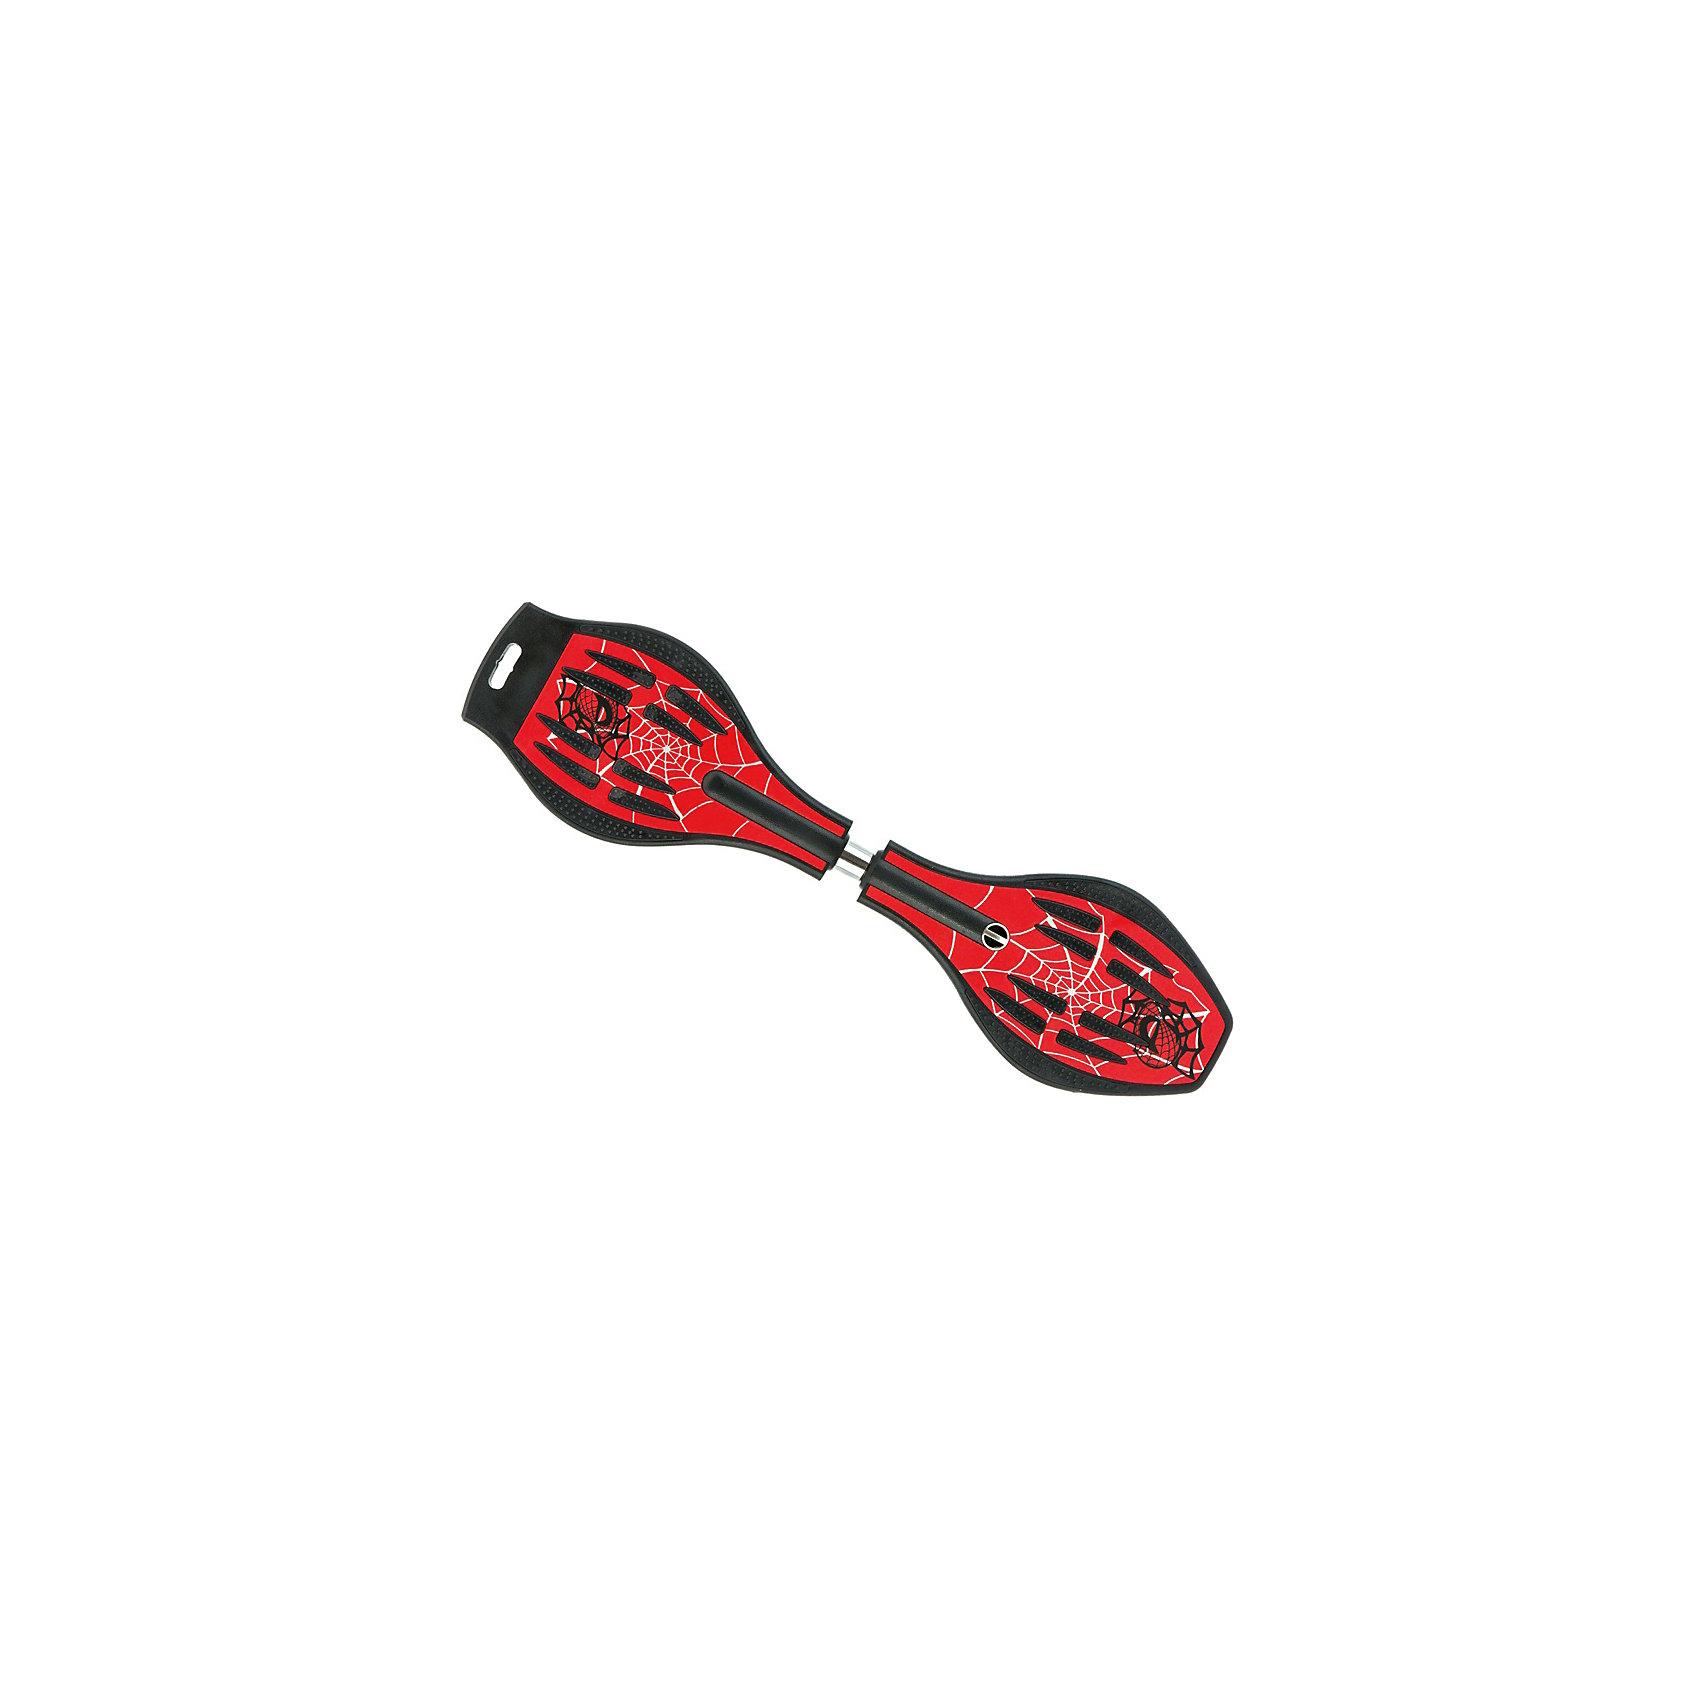 Роллерсерф   Dragon Board Spiderman,  красный